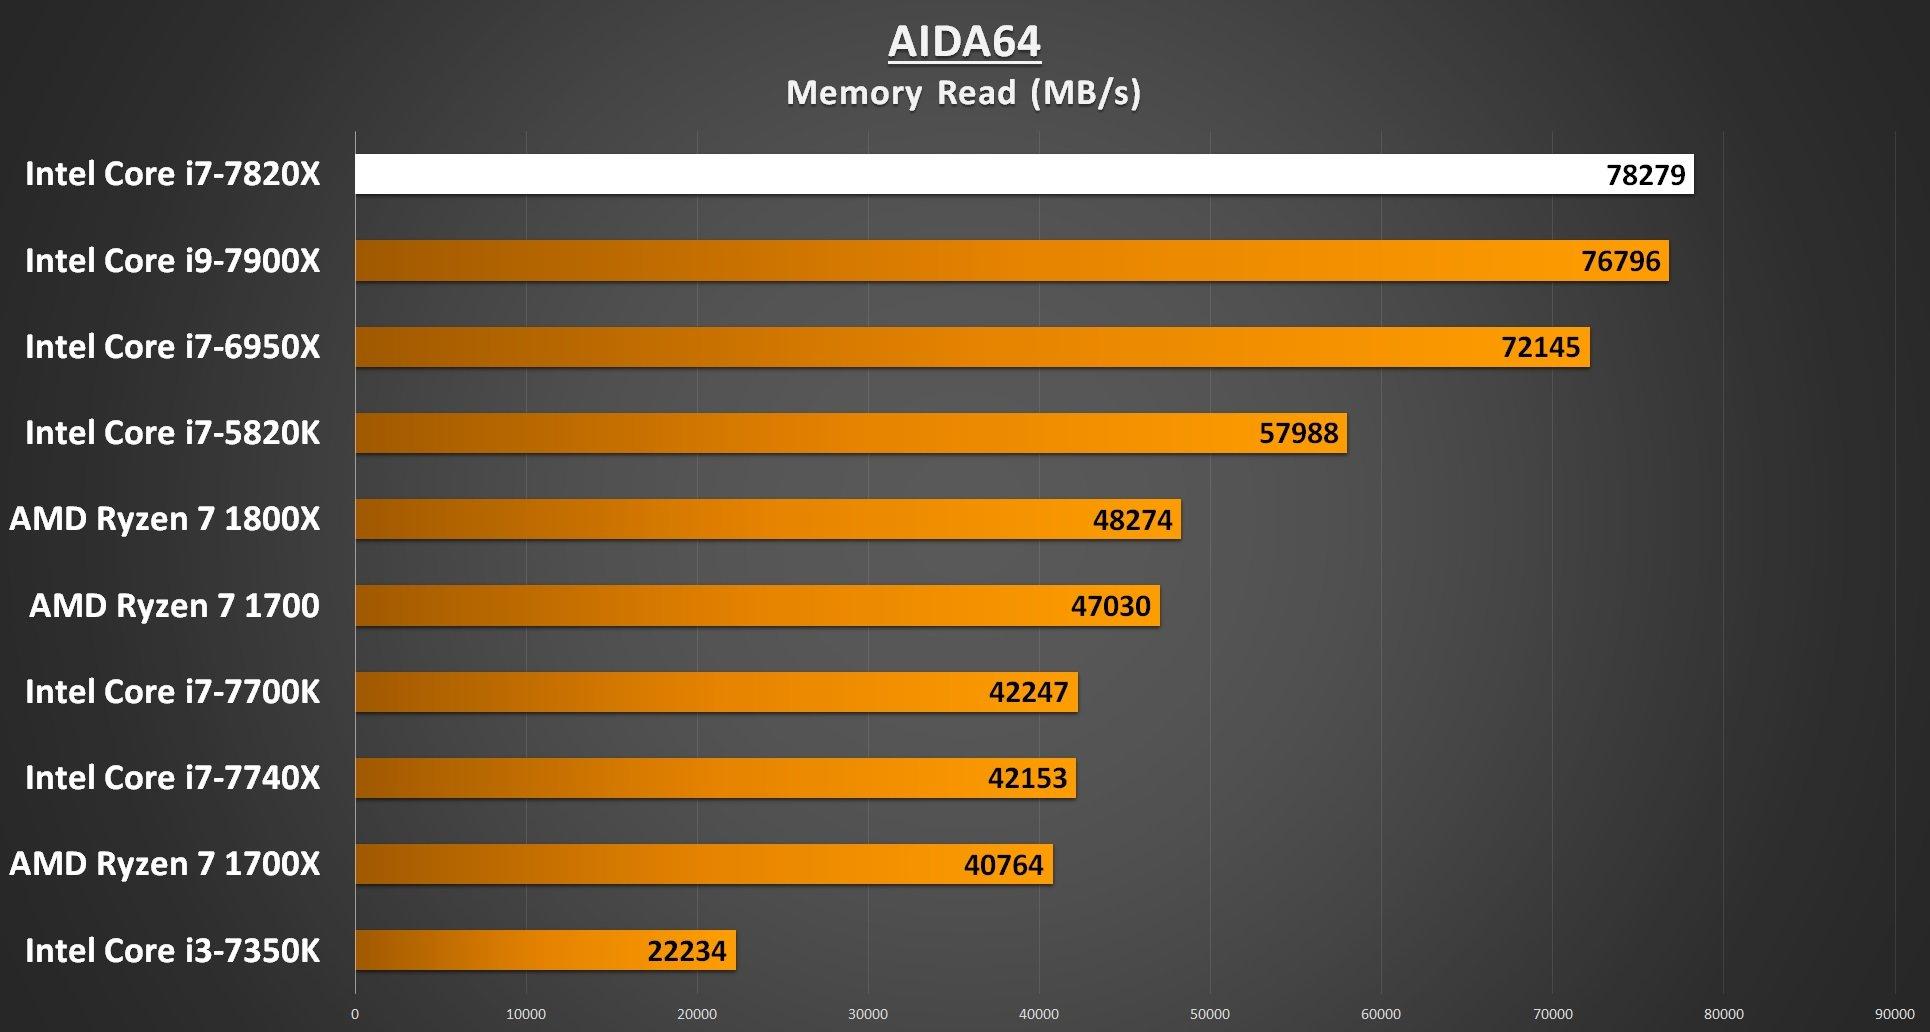 AIDA64 Memory Read - i7-7820X Performance